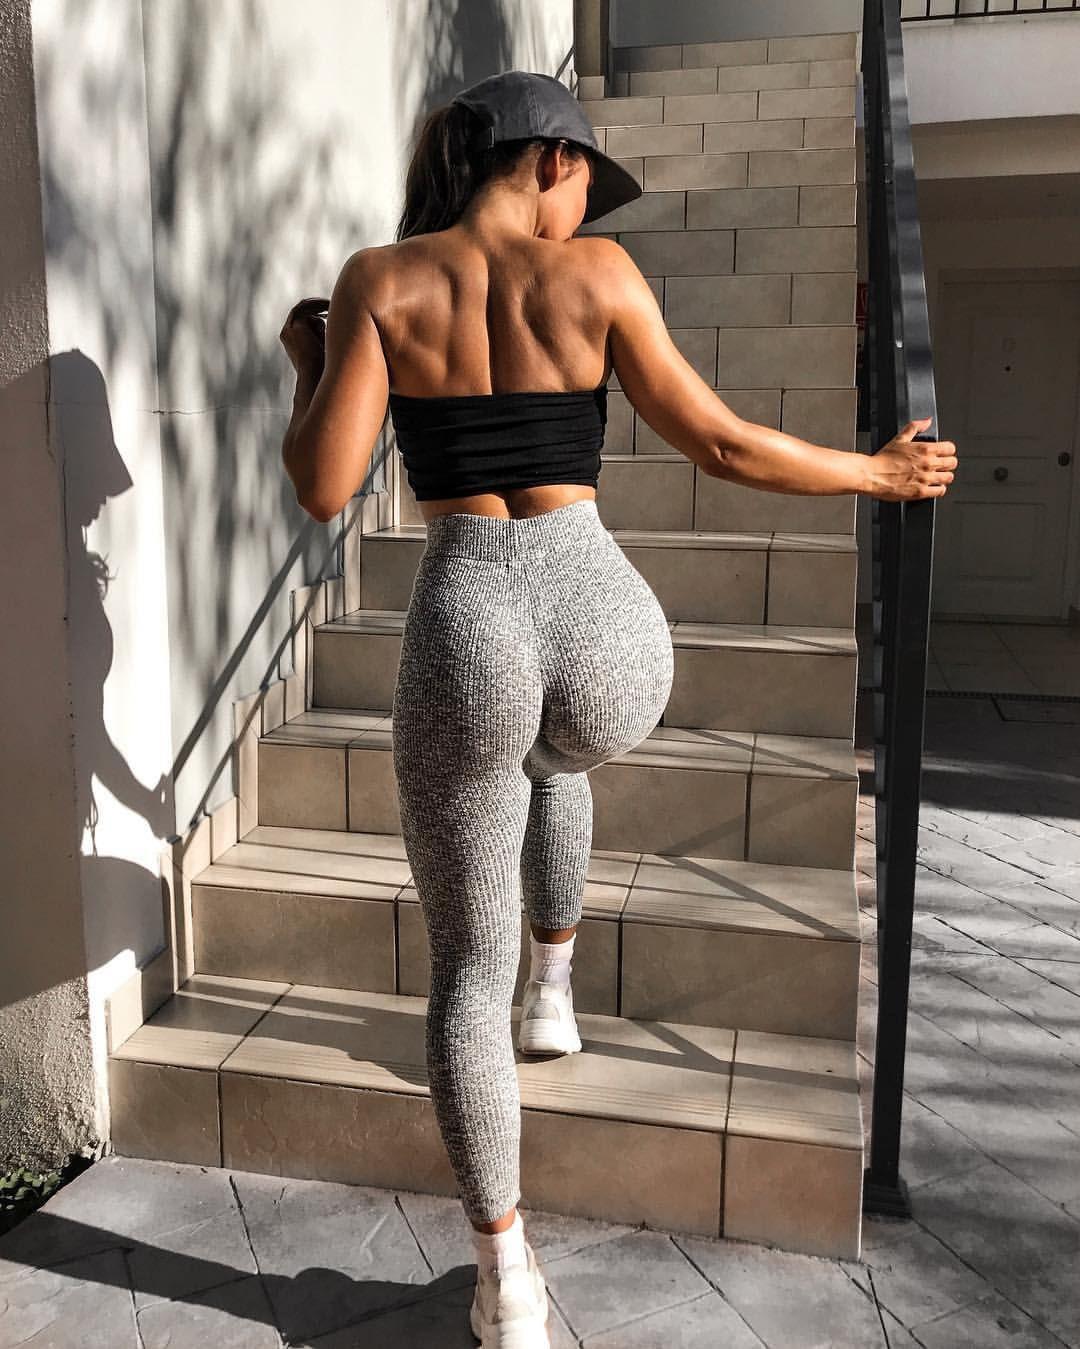 Girl wearing nothing but yoga pants